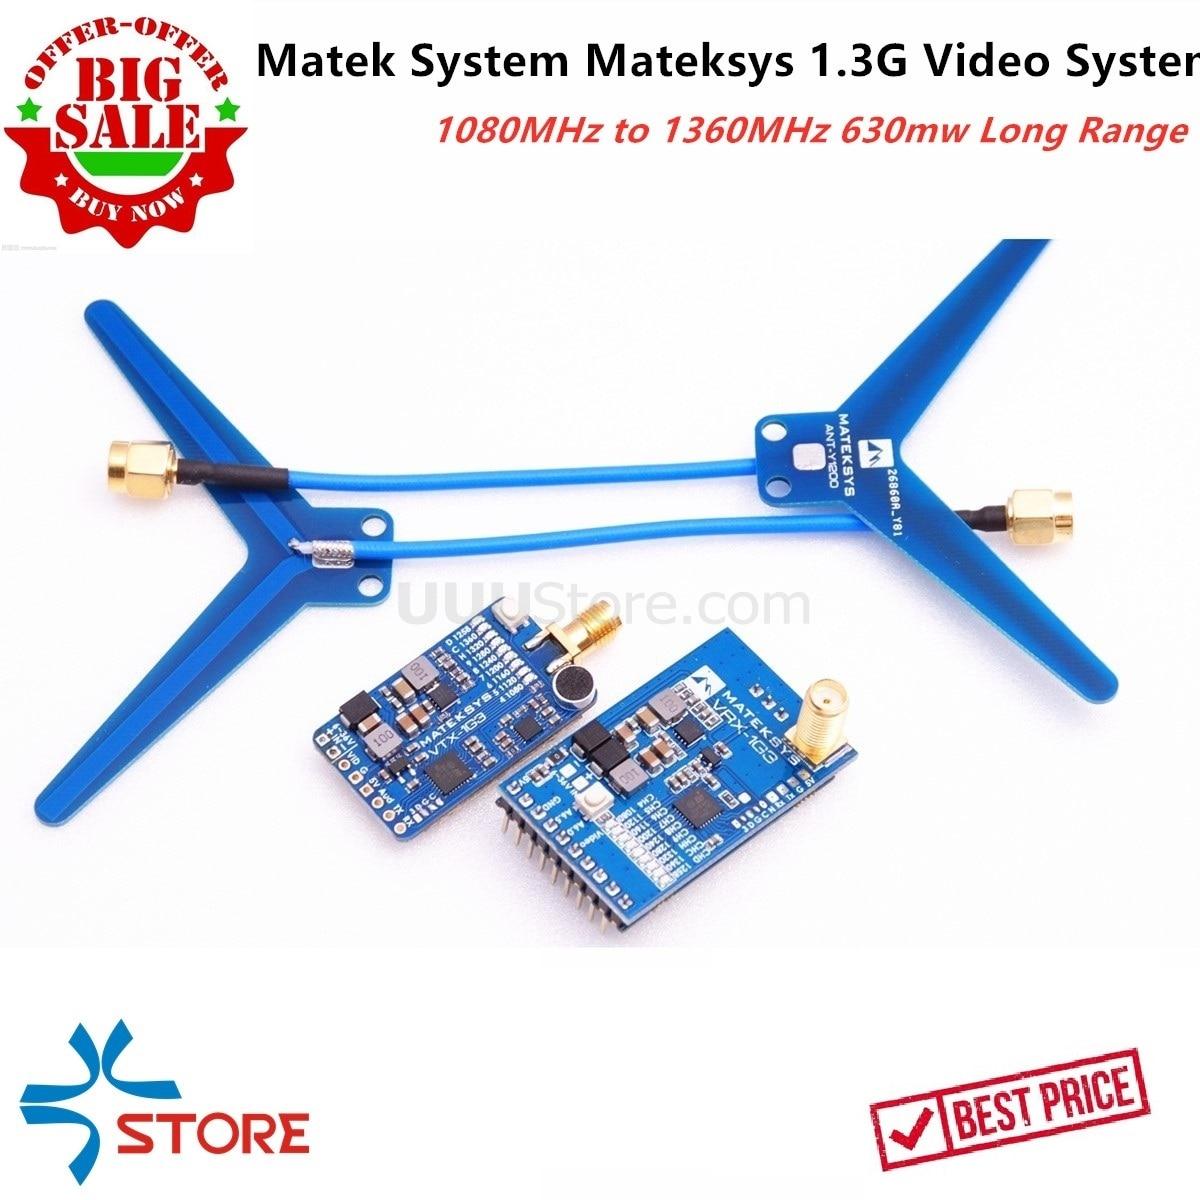 40KM Lange Palette Matek System Mateksys VRX-1G3 VTX-1G3 1,3 GHz FPV 2CH-9CH 630mW Video Sender Wid Band Video empfänger